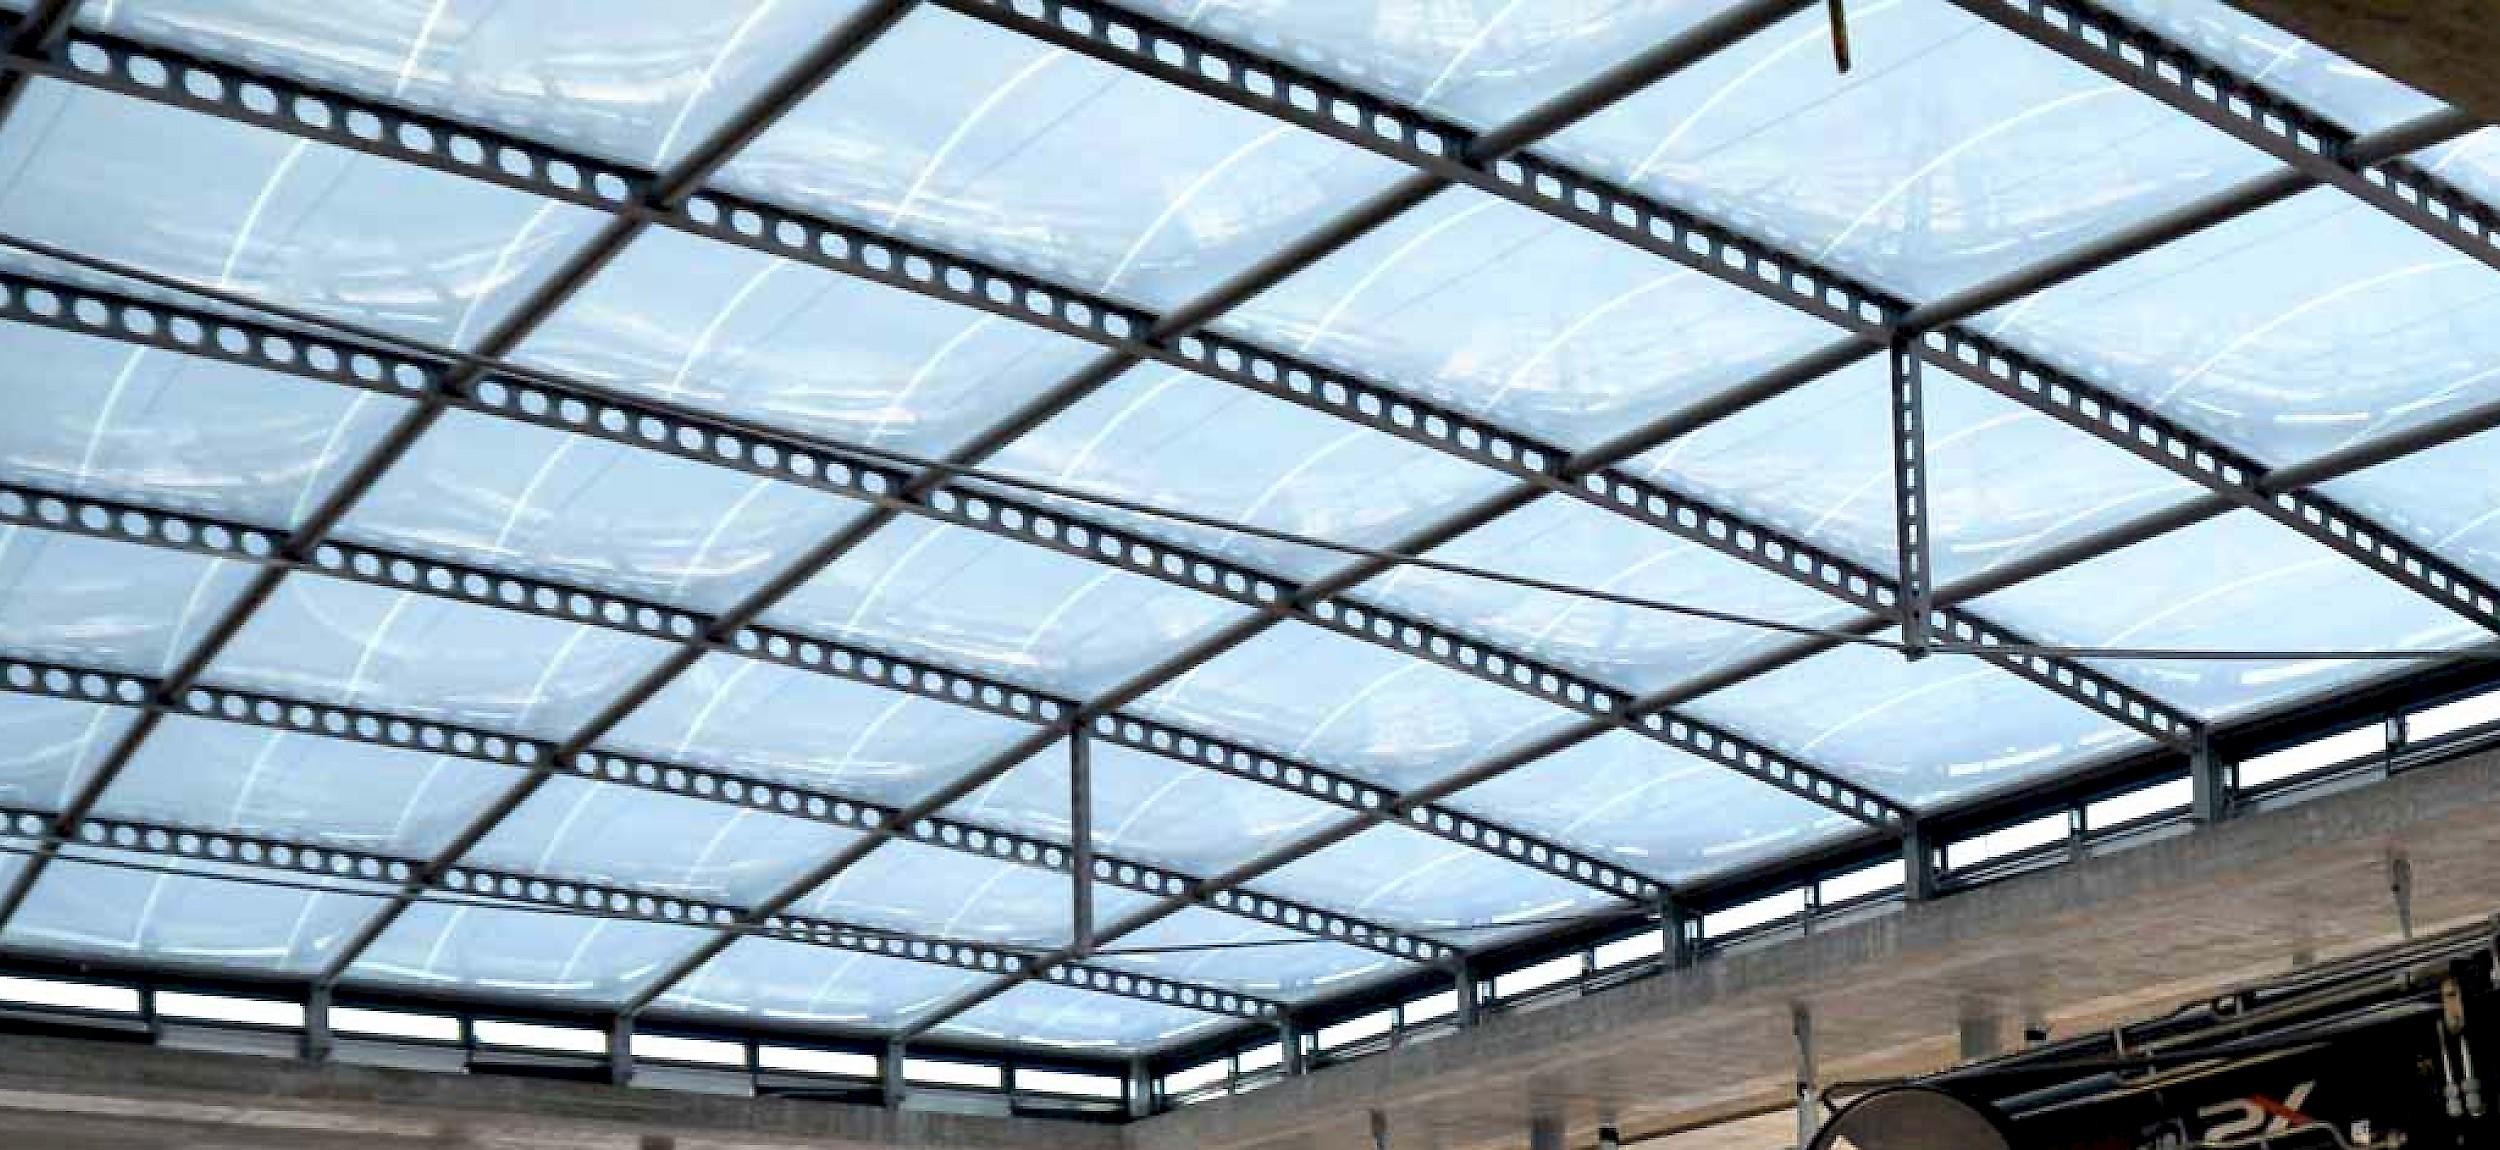 Solarlux Melle etfe dach solarlux schülkewiesmann